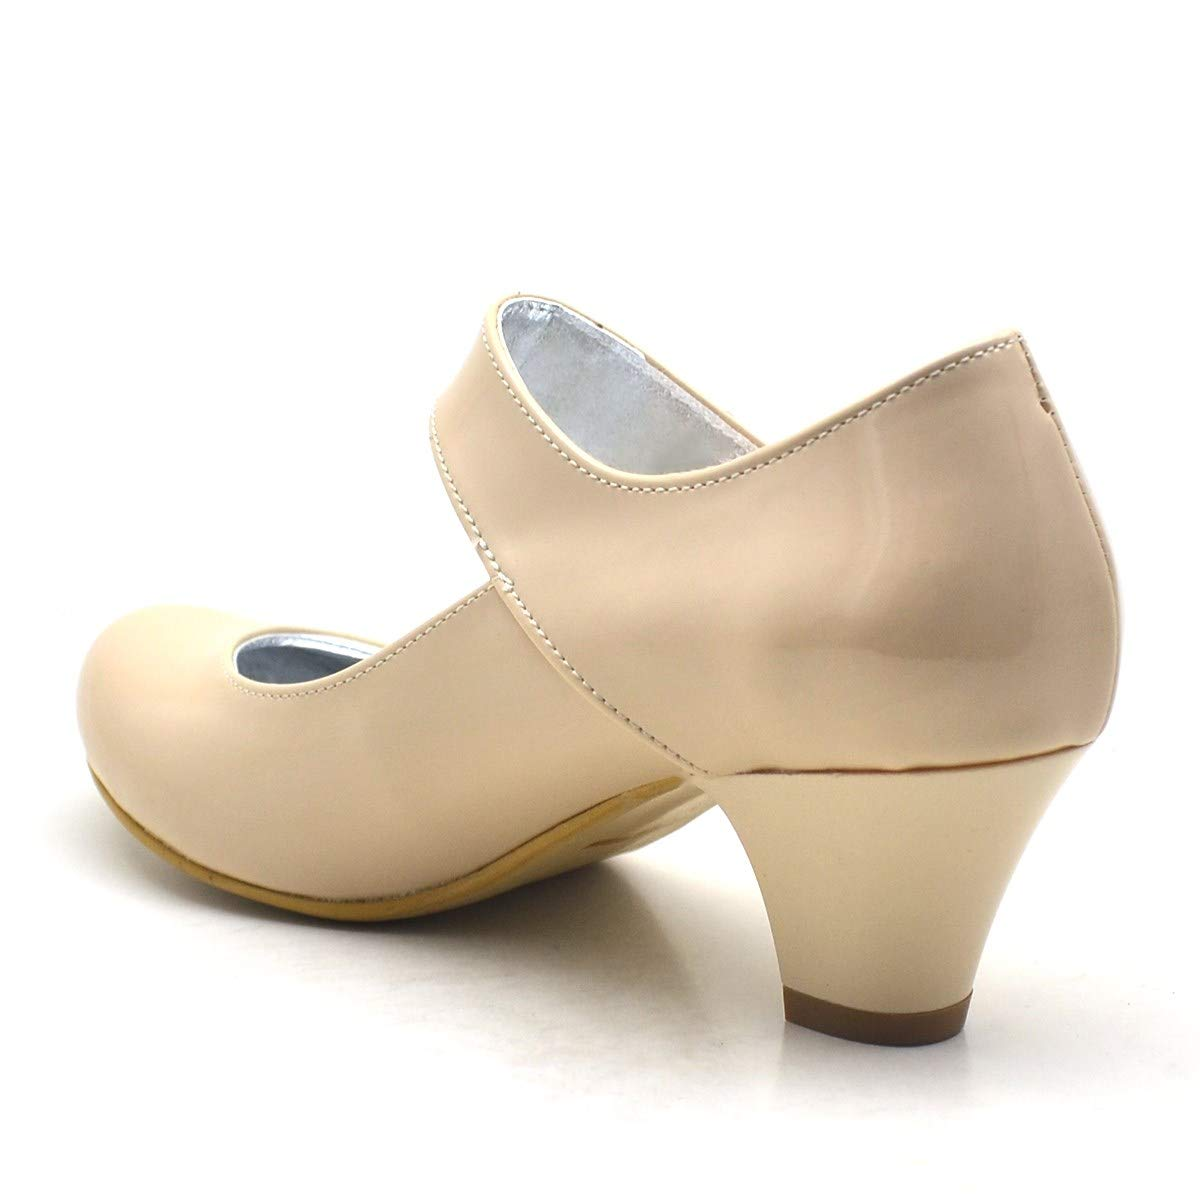 a6b41e1c9a61a Sarıkaya Rugan Taşlı Ten Rengi Topuklu Kız Çocuk Abiye Ayakkabı:  Amazon.com.tr: Hapshoe